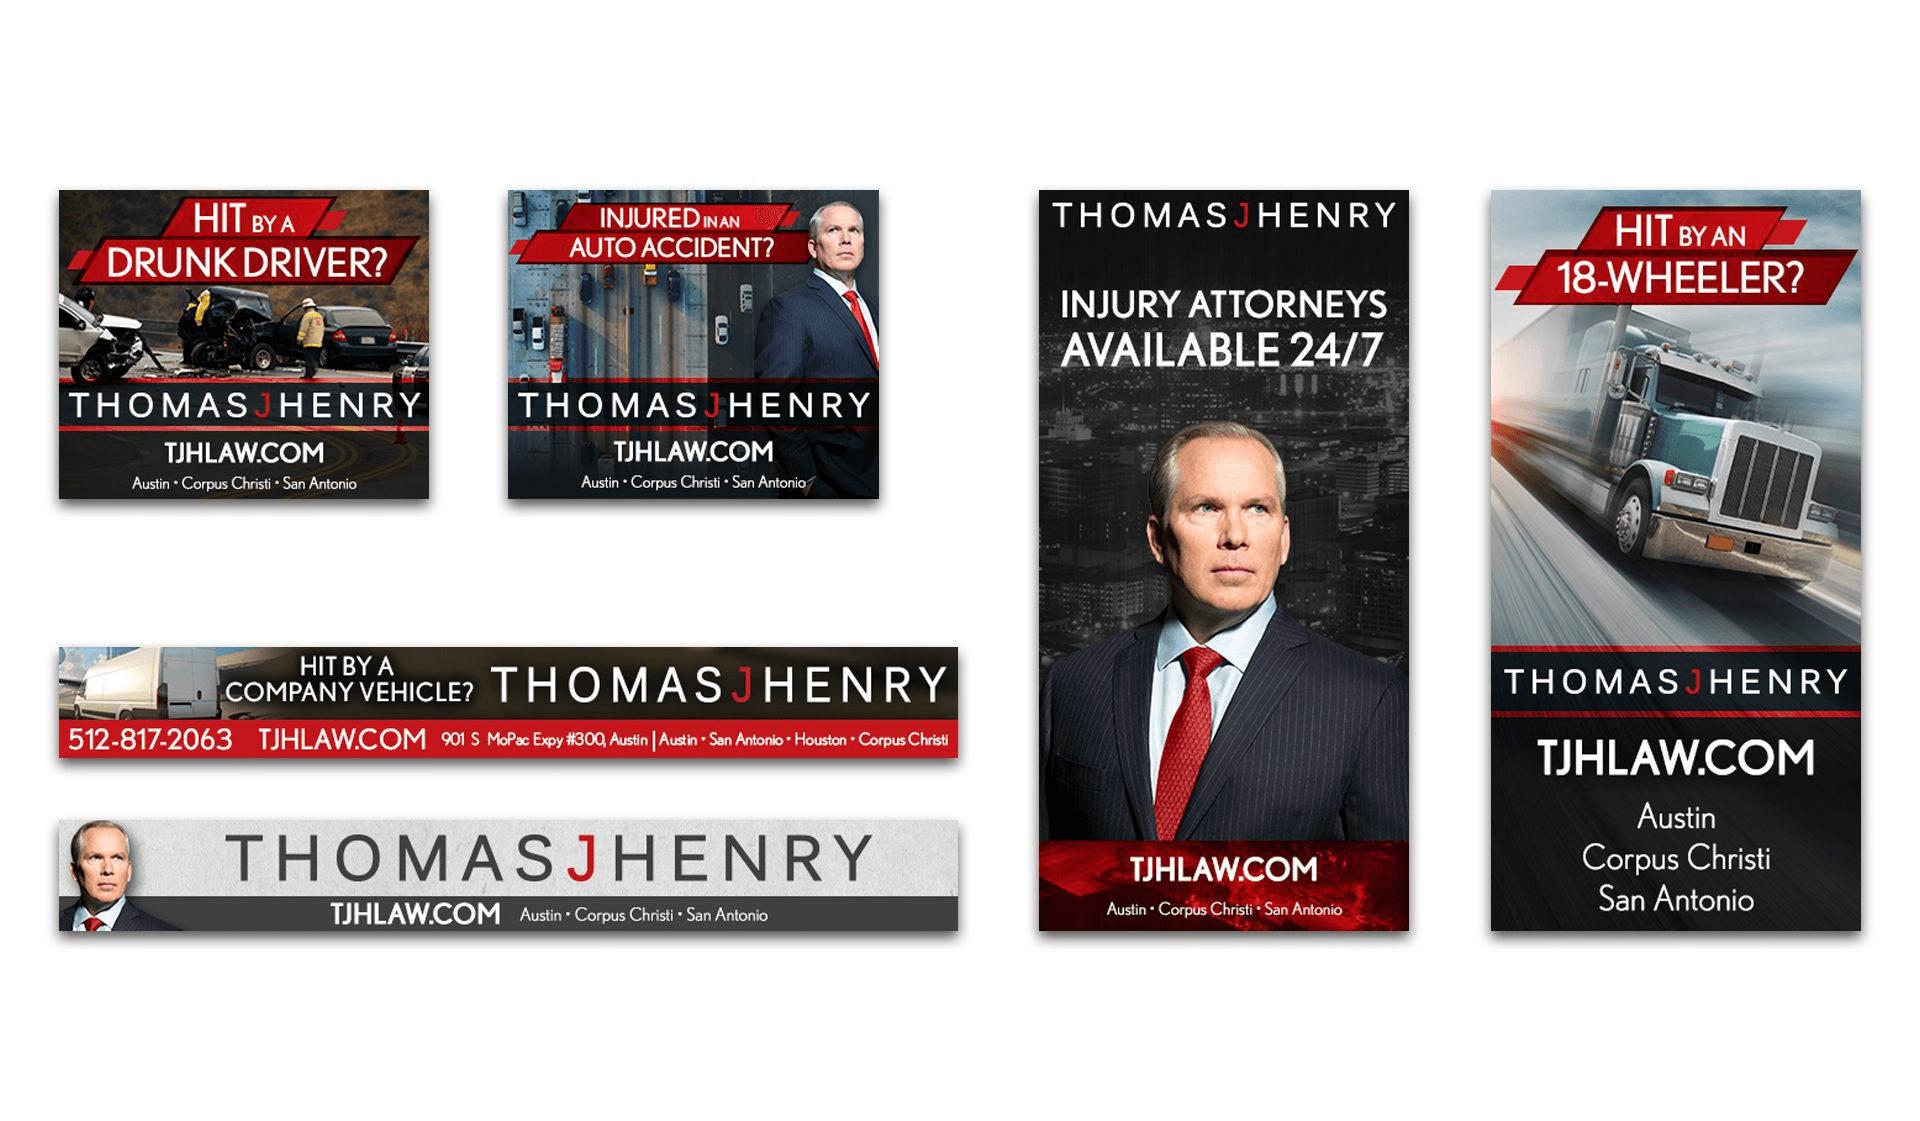 TJH Digital Ads